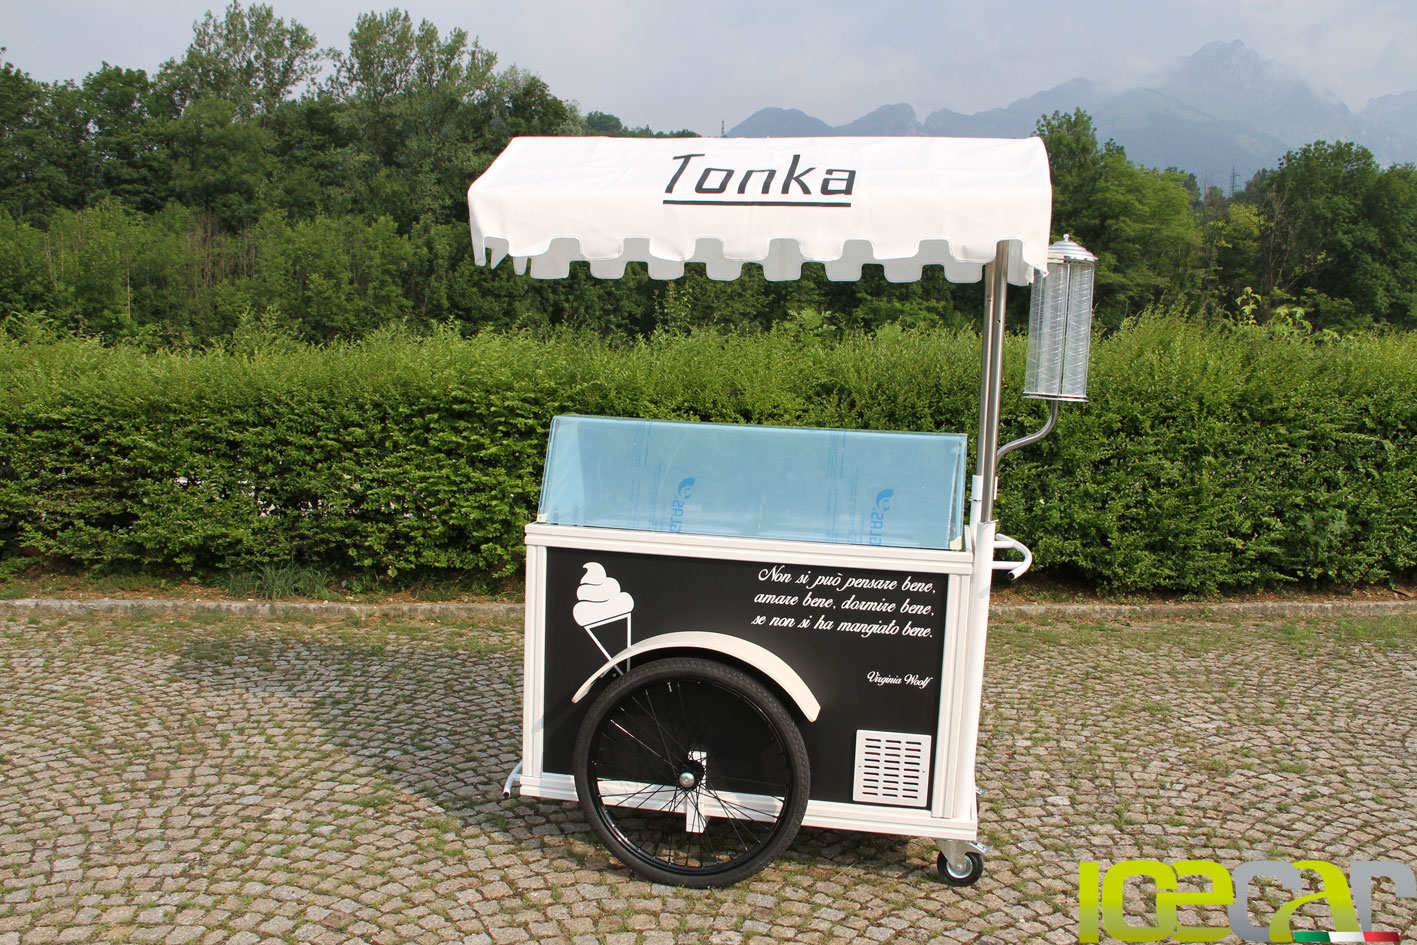 carrettino gelati foto Pasticceria Tonka